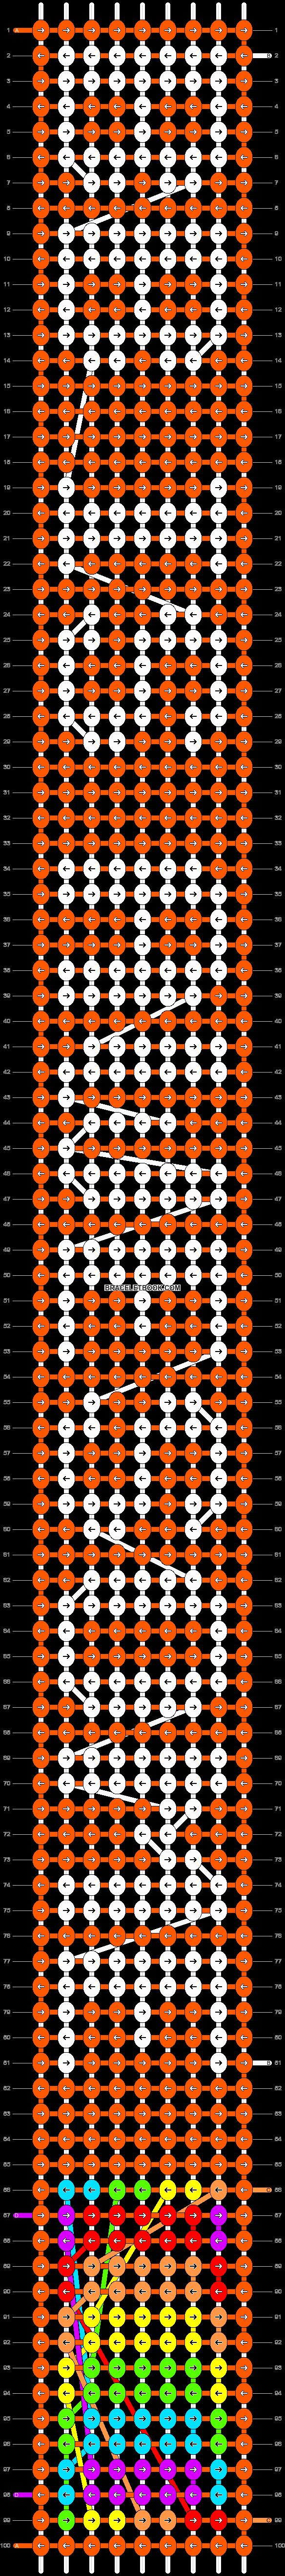 Alpha pattern #9106 pattern